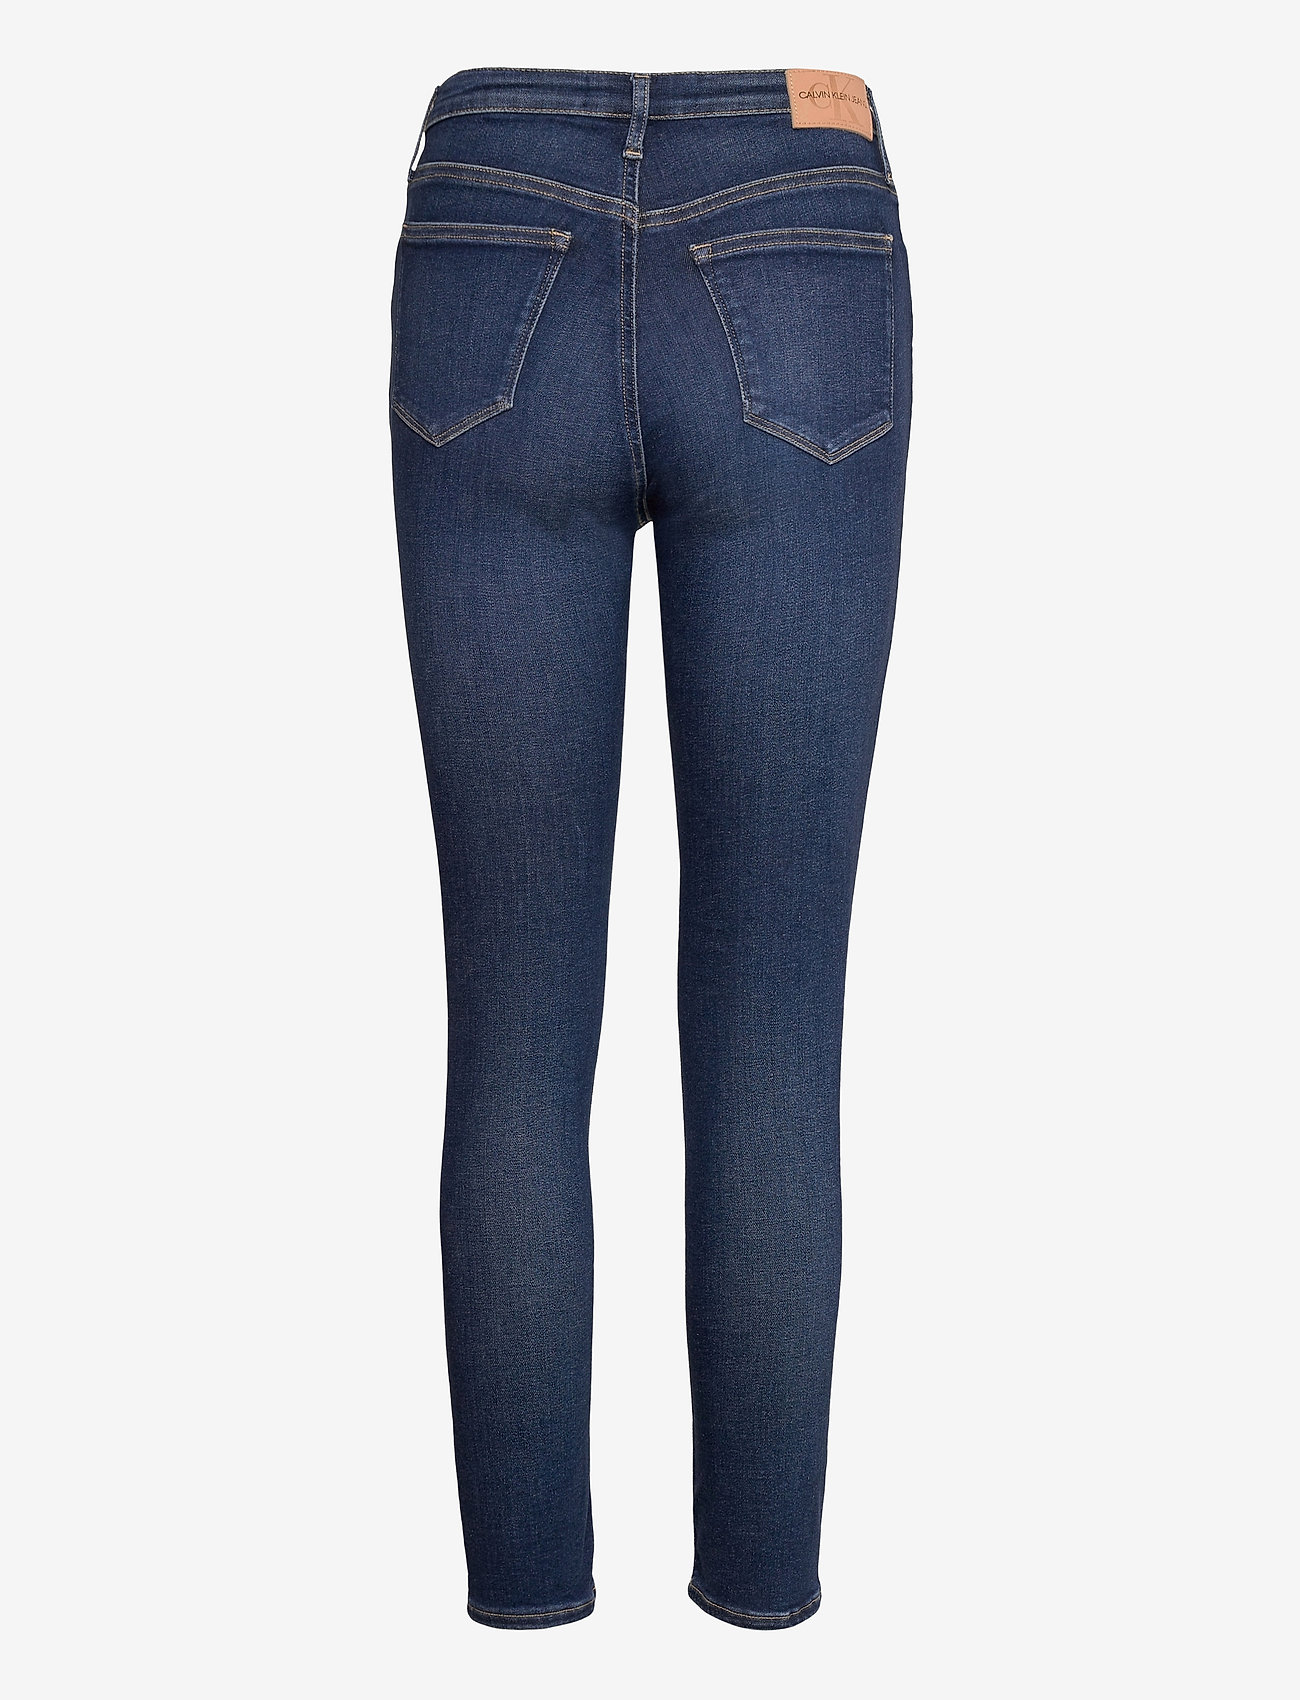 Calvin Klein Jeans - HIGH RISE SKINNY - skinny jeans - denim dark - 1